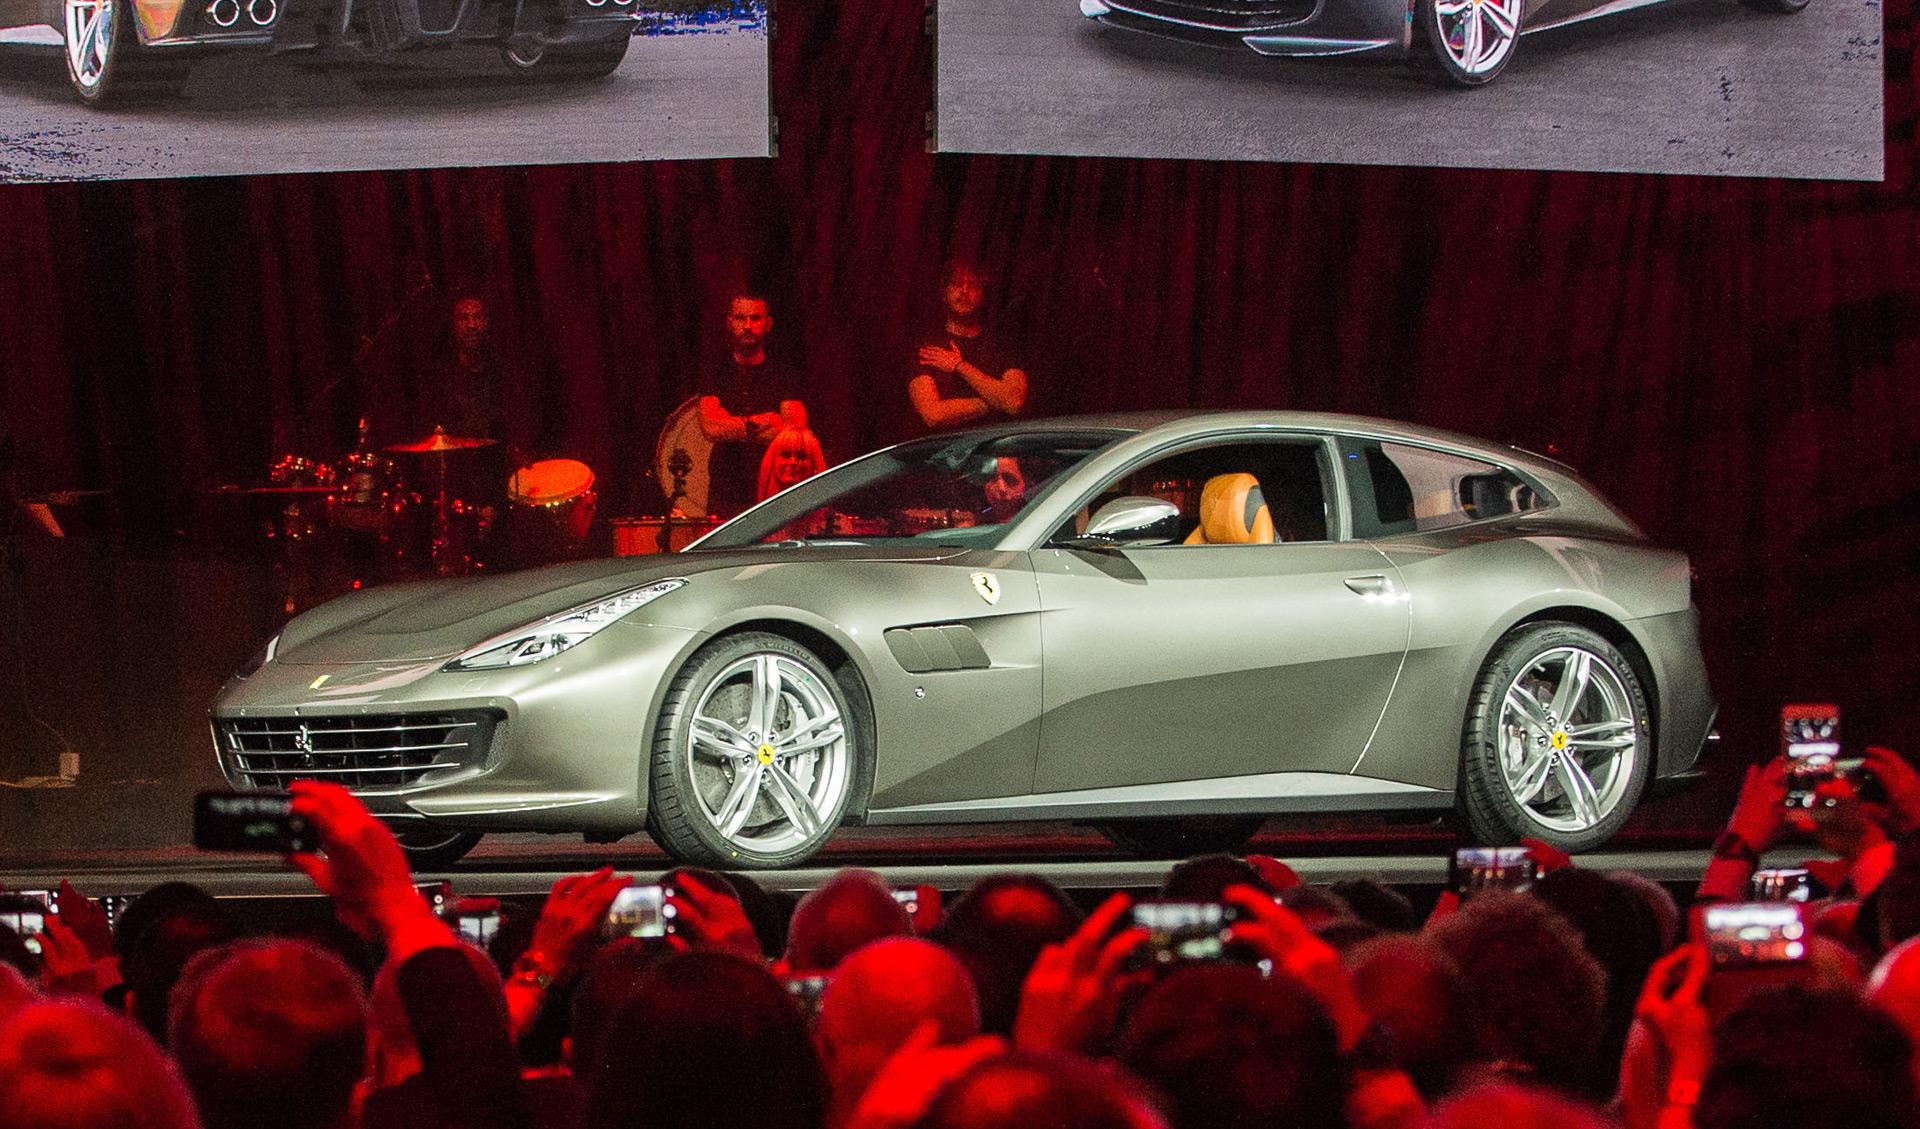 Ferrari Gtc4 Lusso Makes Villa Erba Debut Video